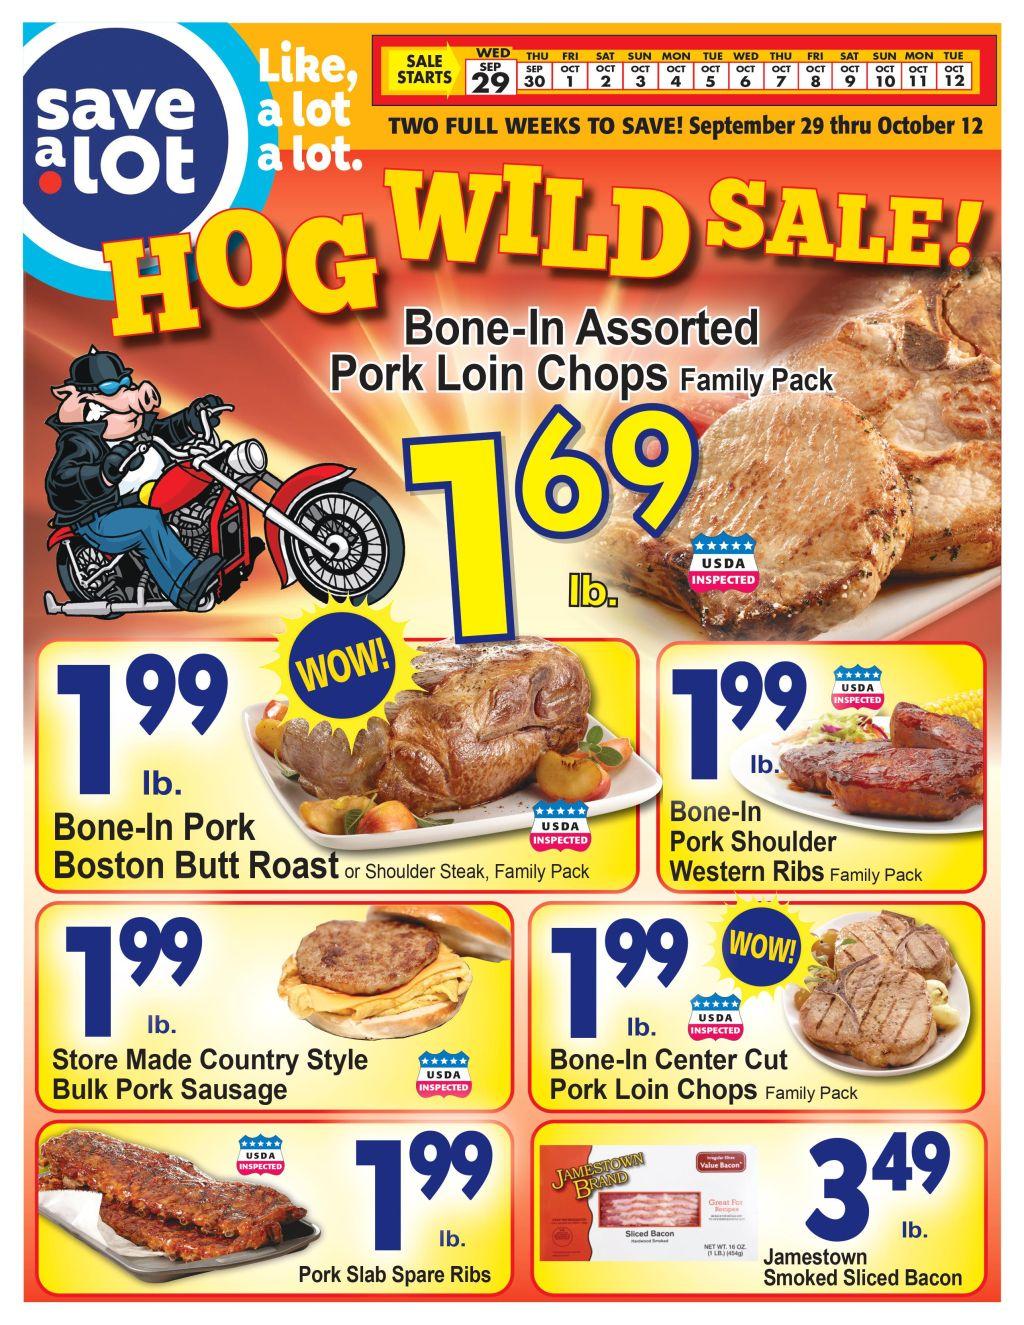 Save A Lot Hog Wild Sale